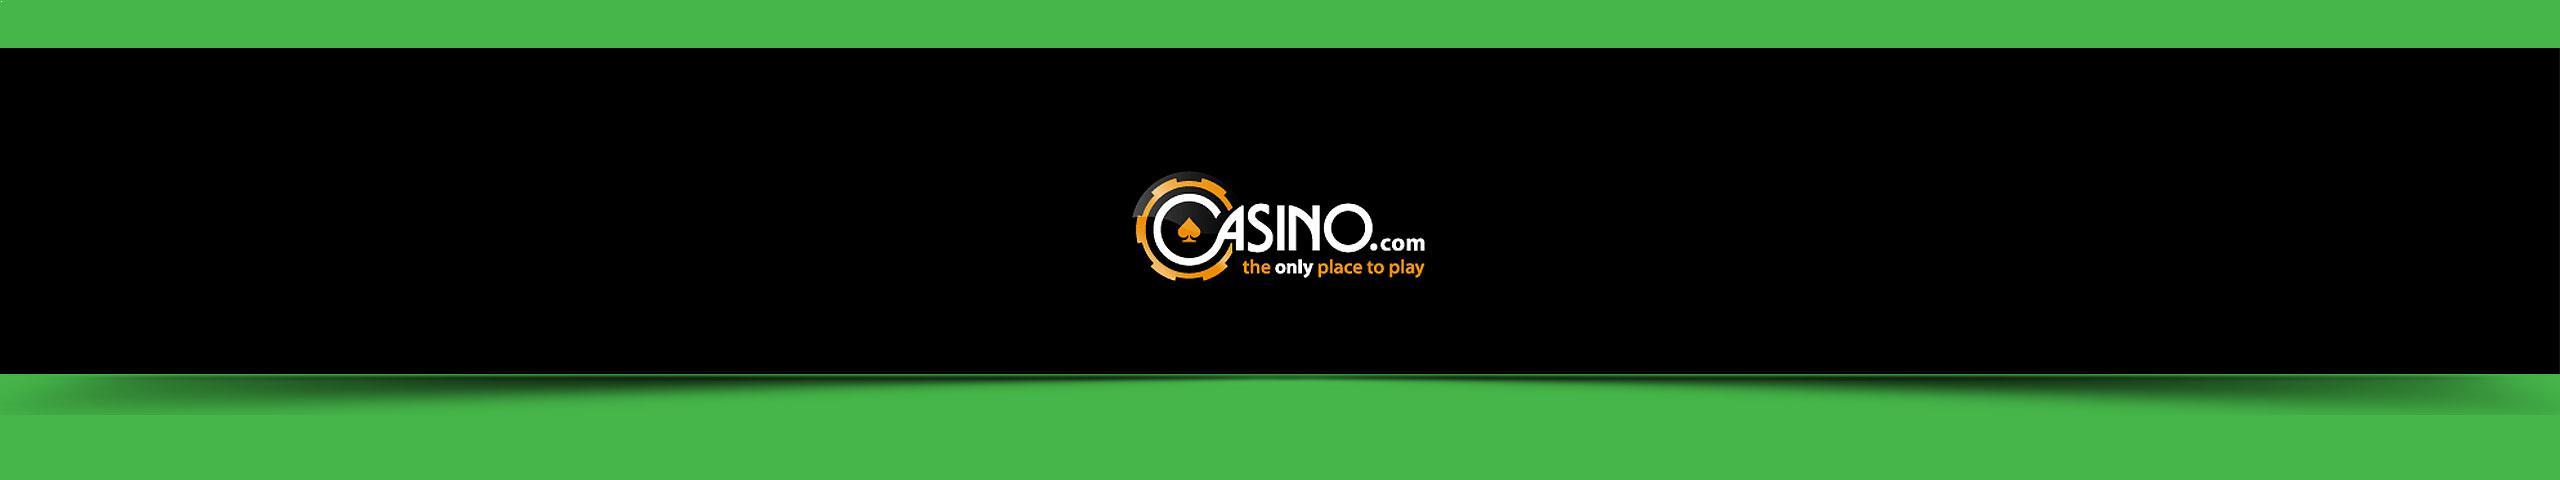 Casino.com Vizualizarea Casino-ului Casino Multa Bafta Slider